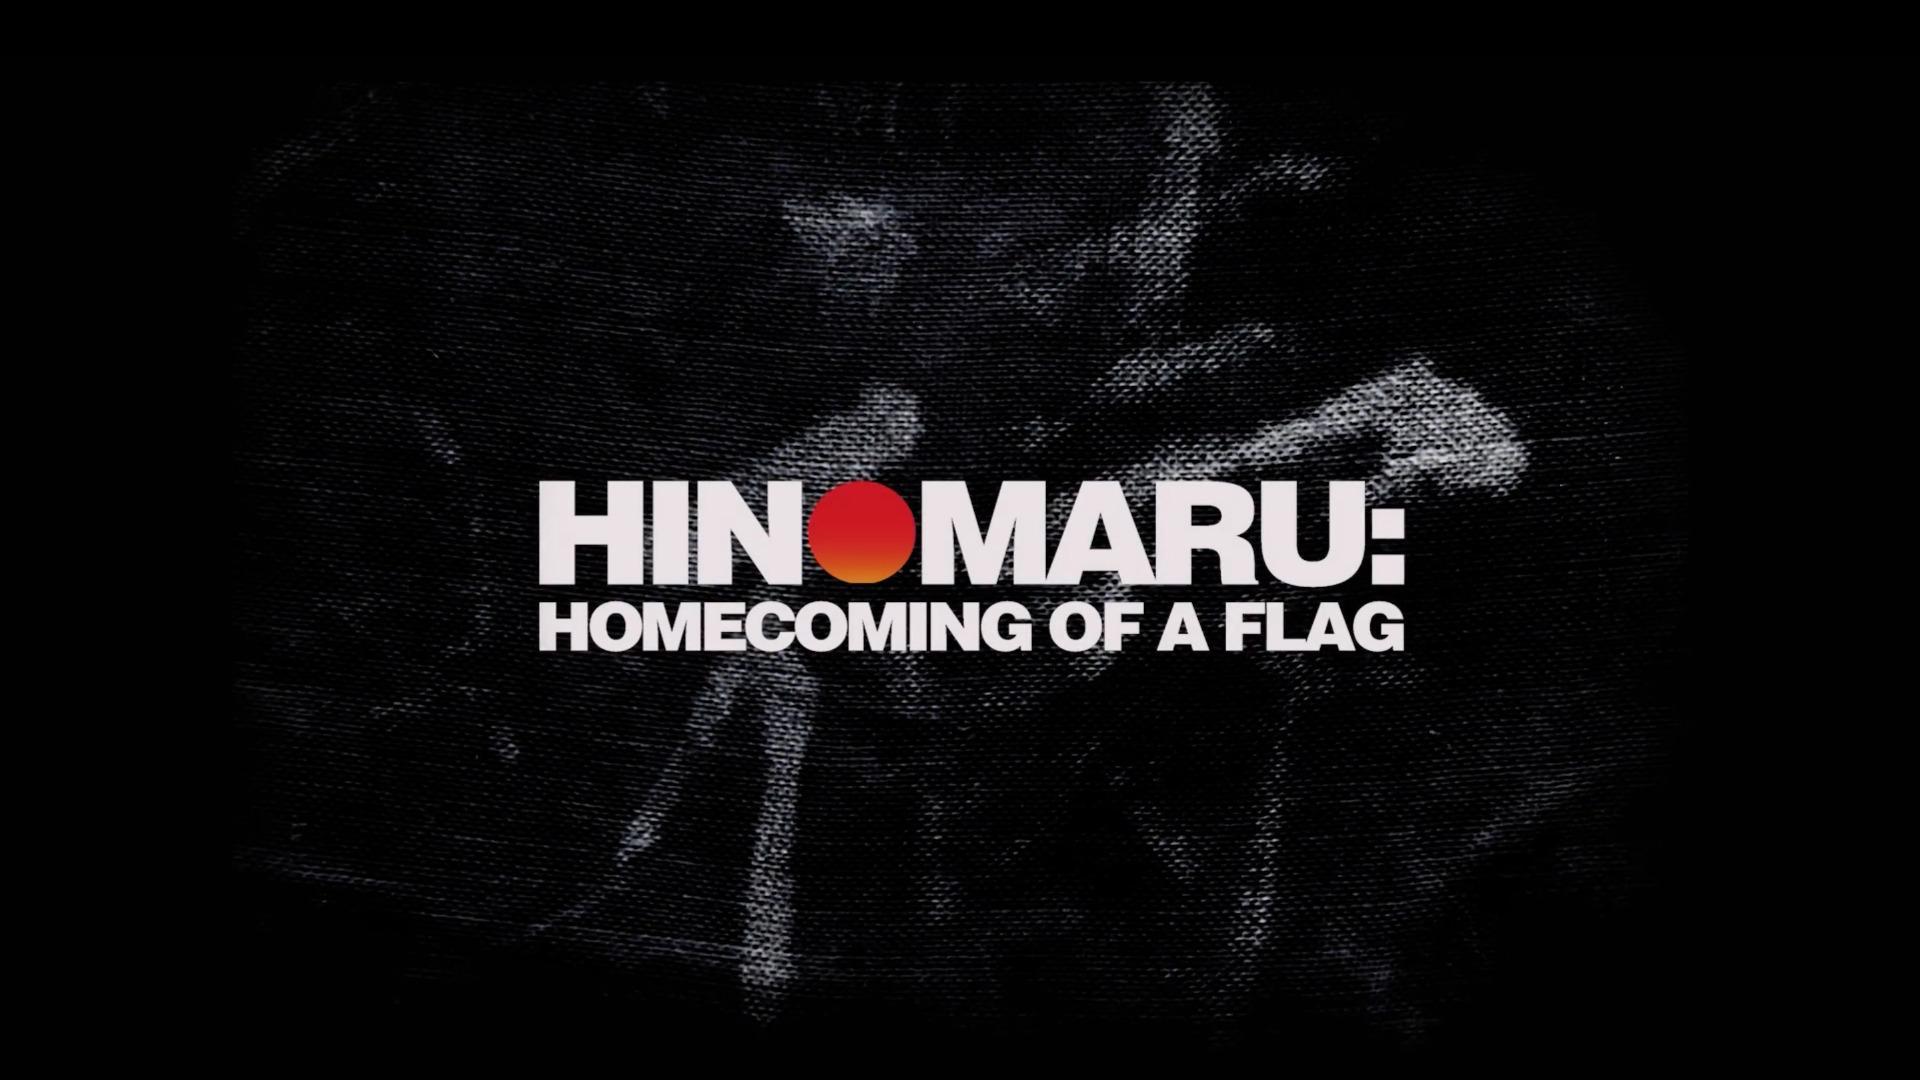 Hinomaru: Homecoming of a Flag